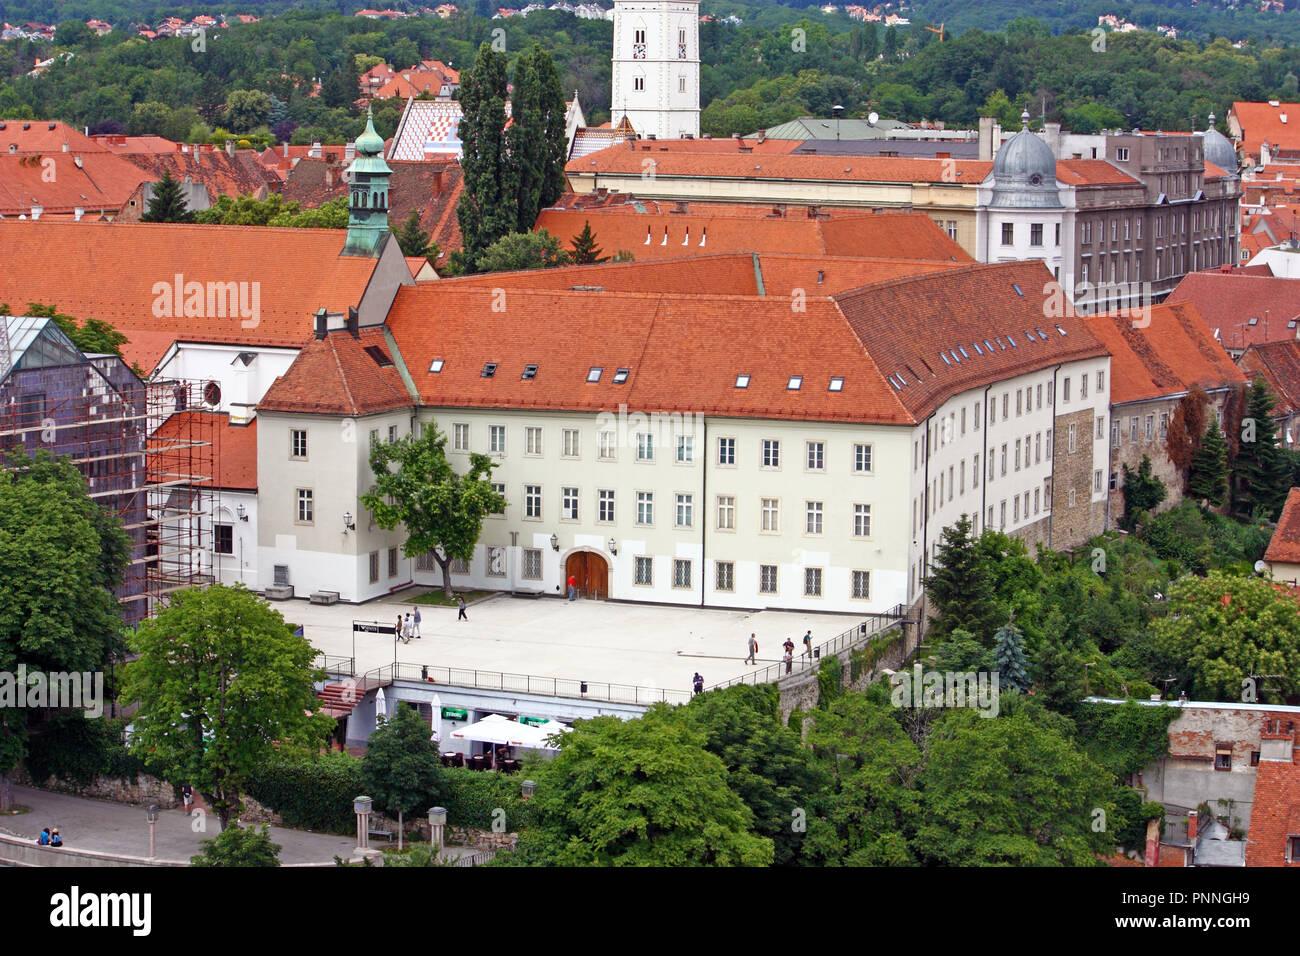 CROATIA ZAGREB, 12 JUNE 2013: View of Klovicevi Dvori Gallery, is an art gallery in Zagreb, Croatia Stock Photo